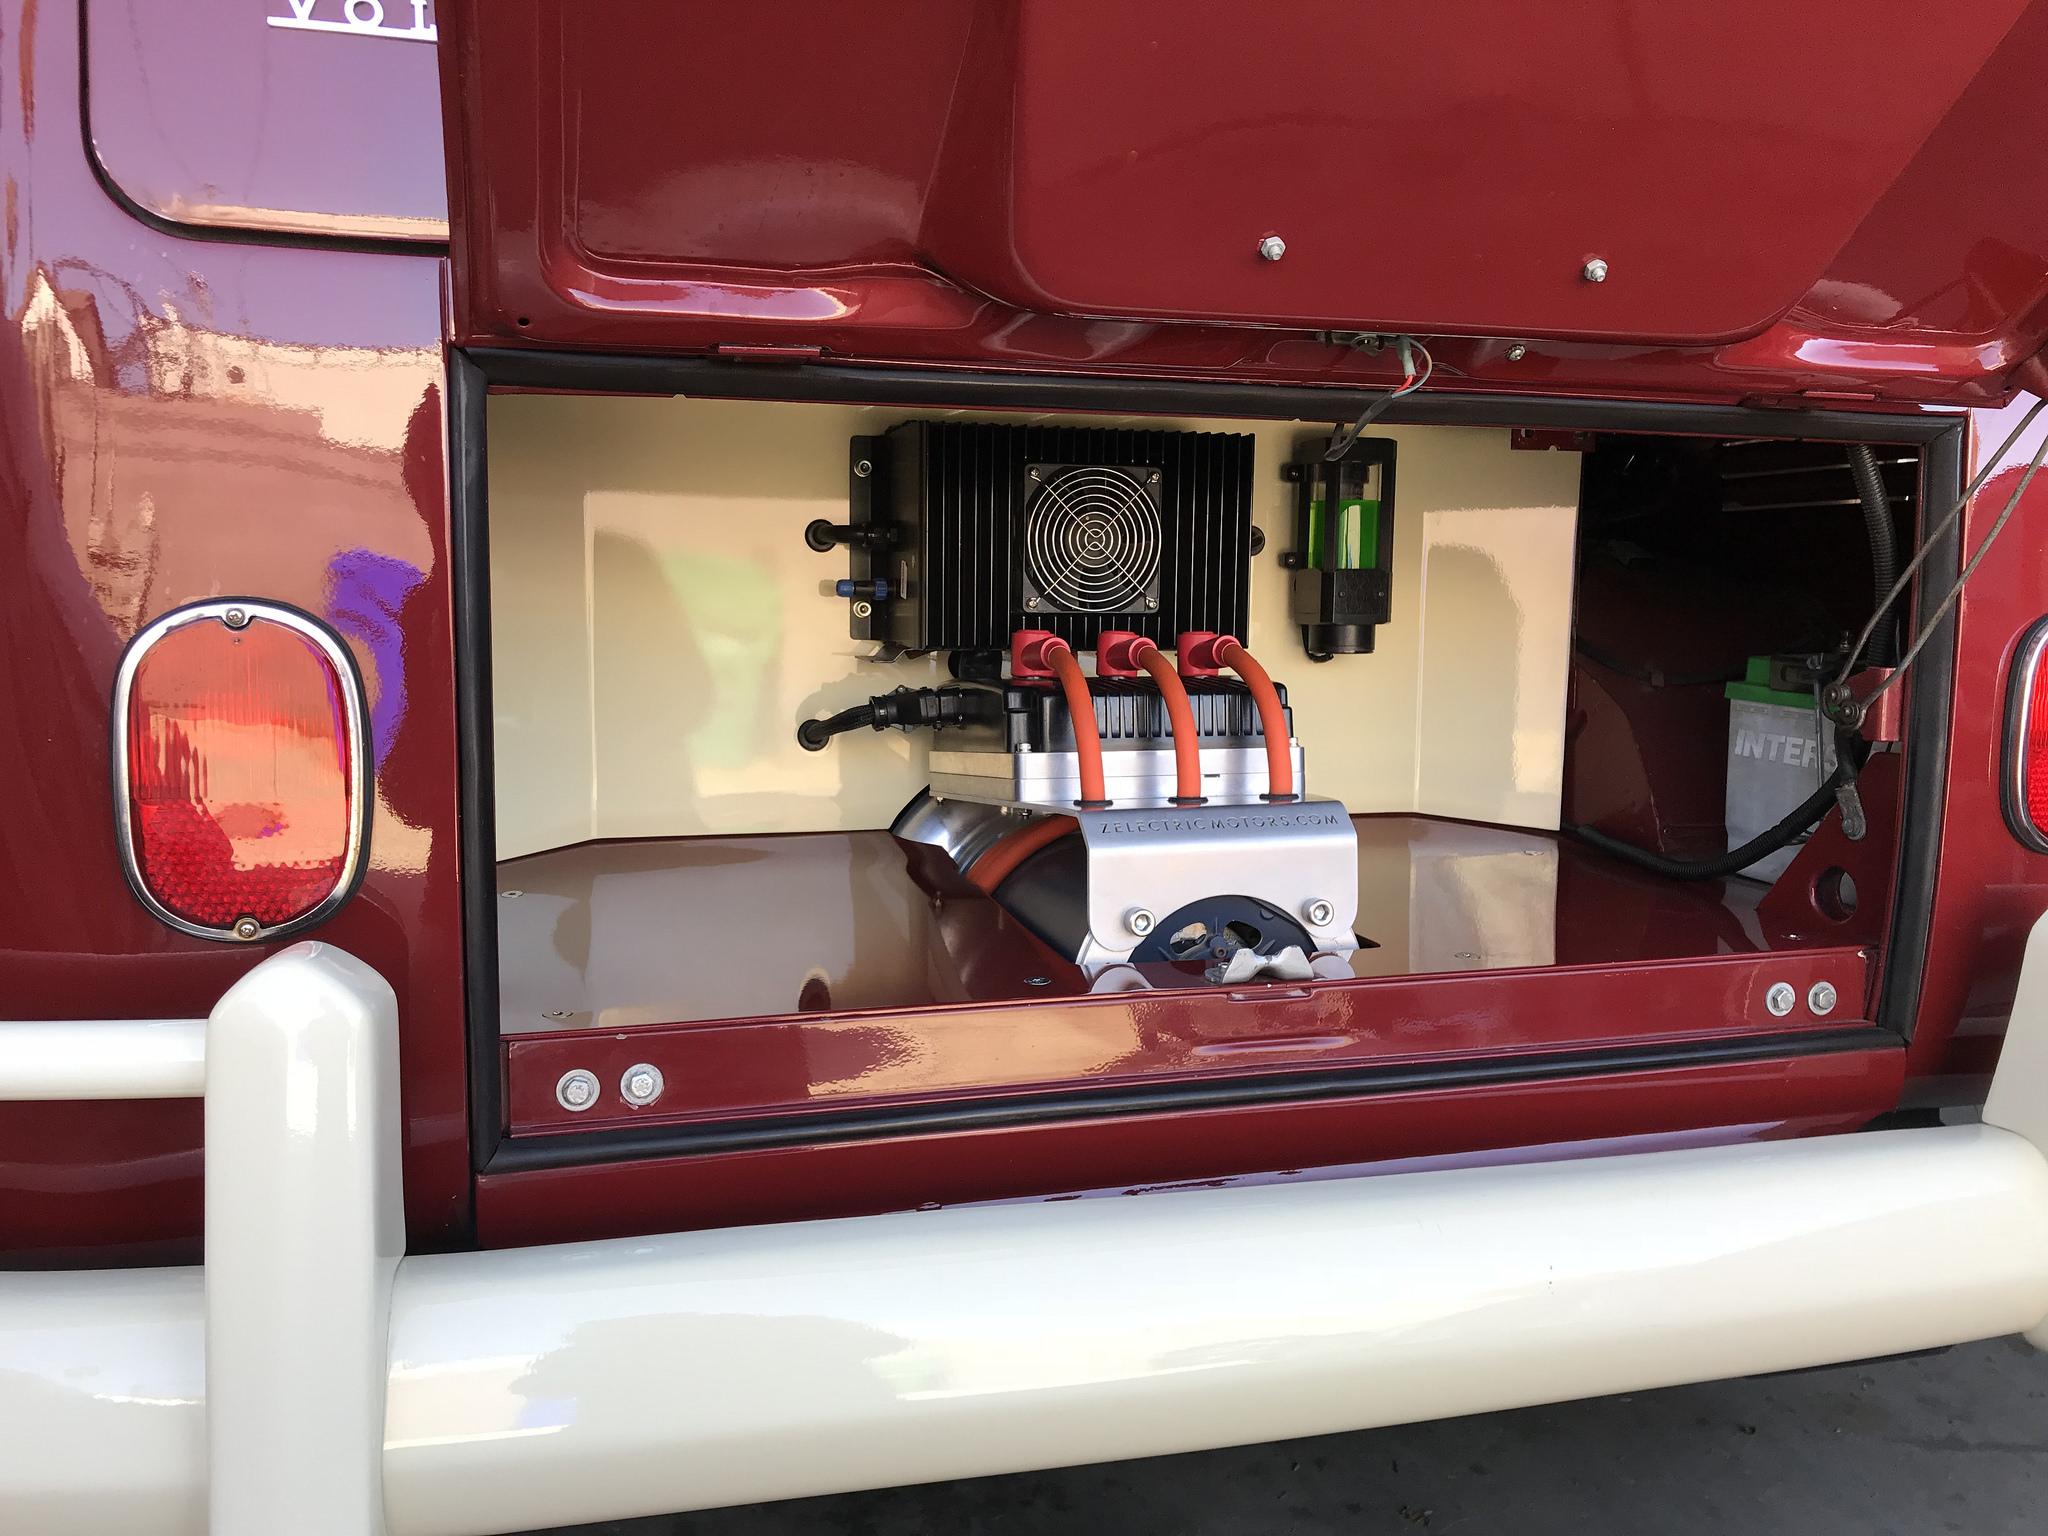 1958 Volkswagen 21 Window Bus EV conversion motor